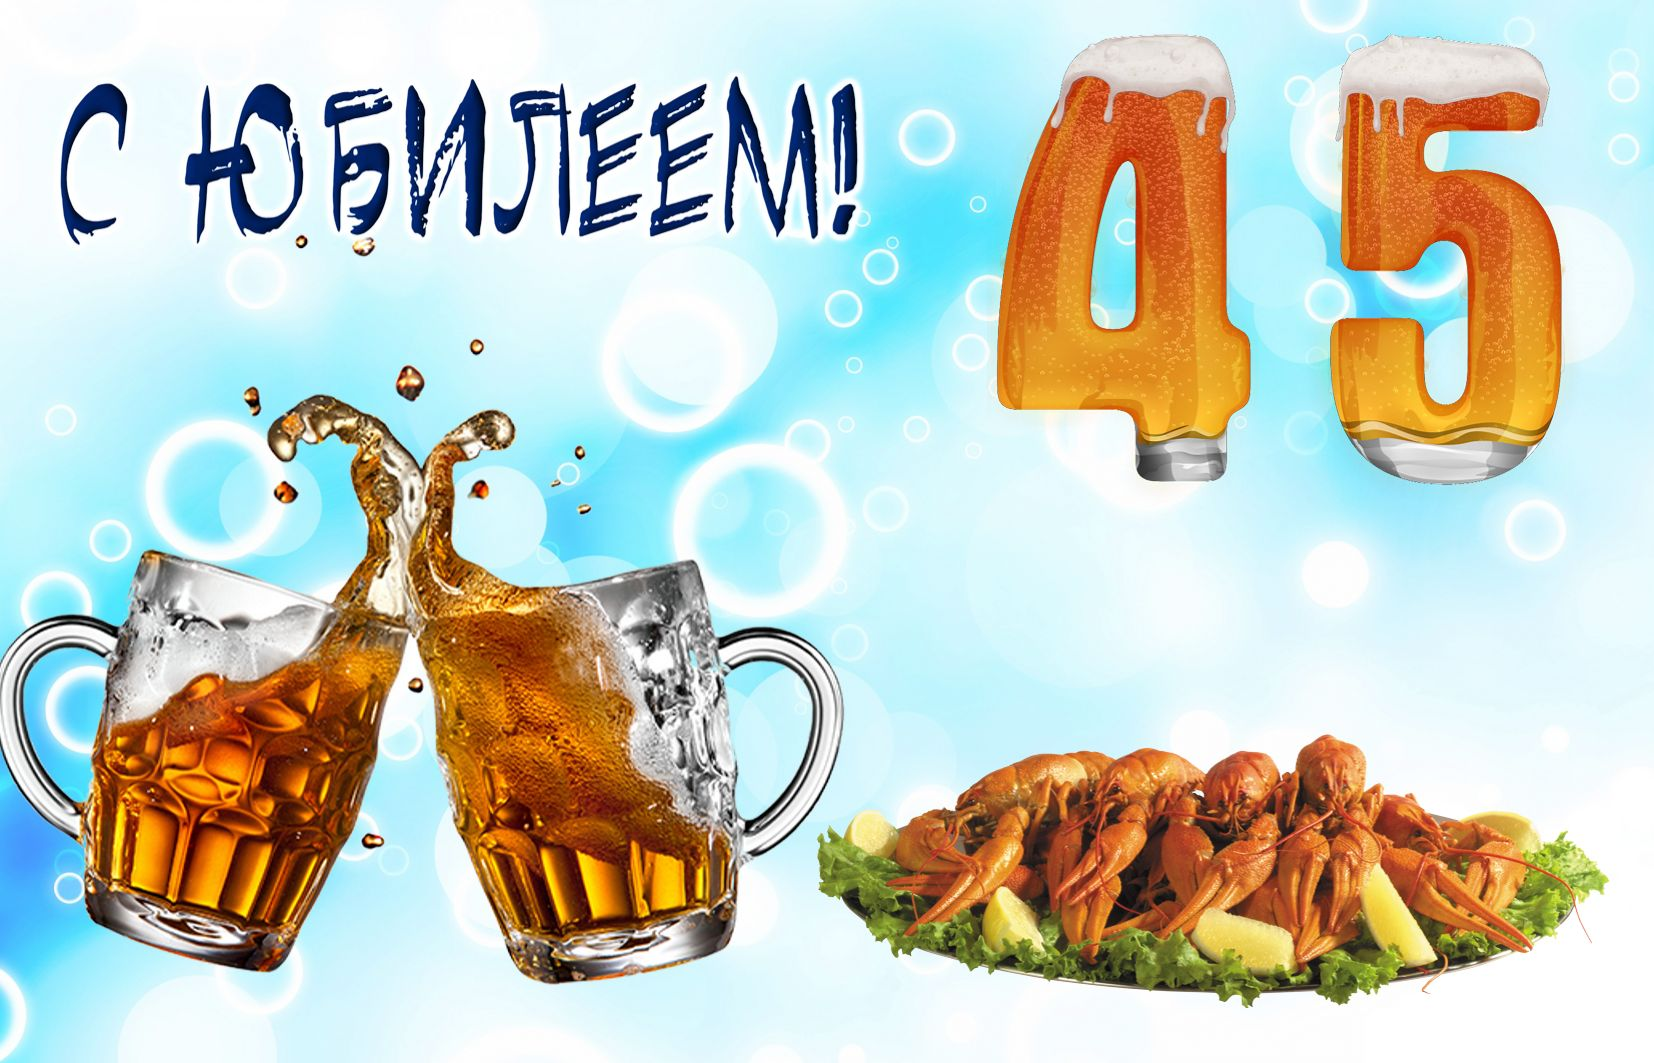 Открытка на юбилей 45 лет - кружки с пивом и раки на тарелочке